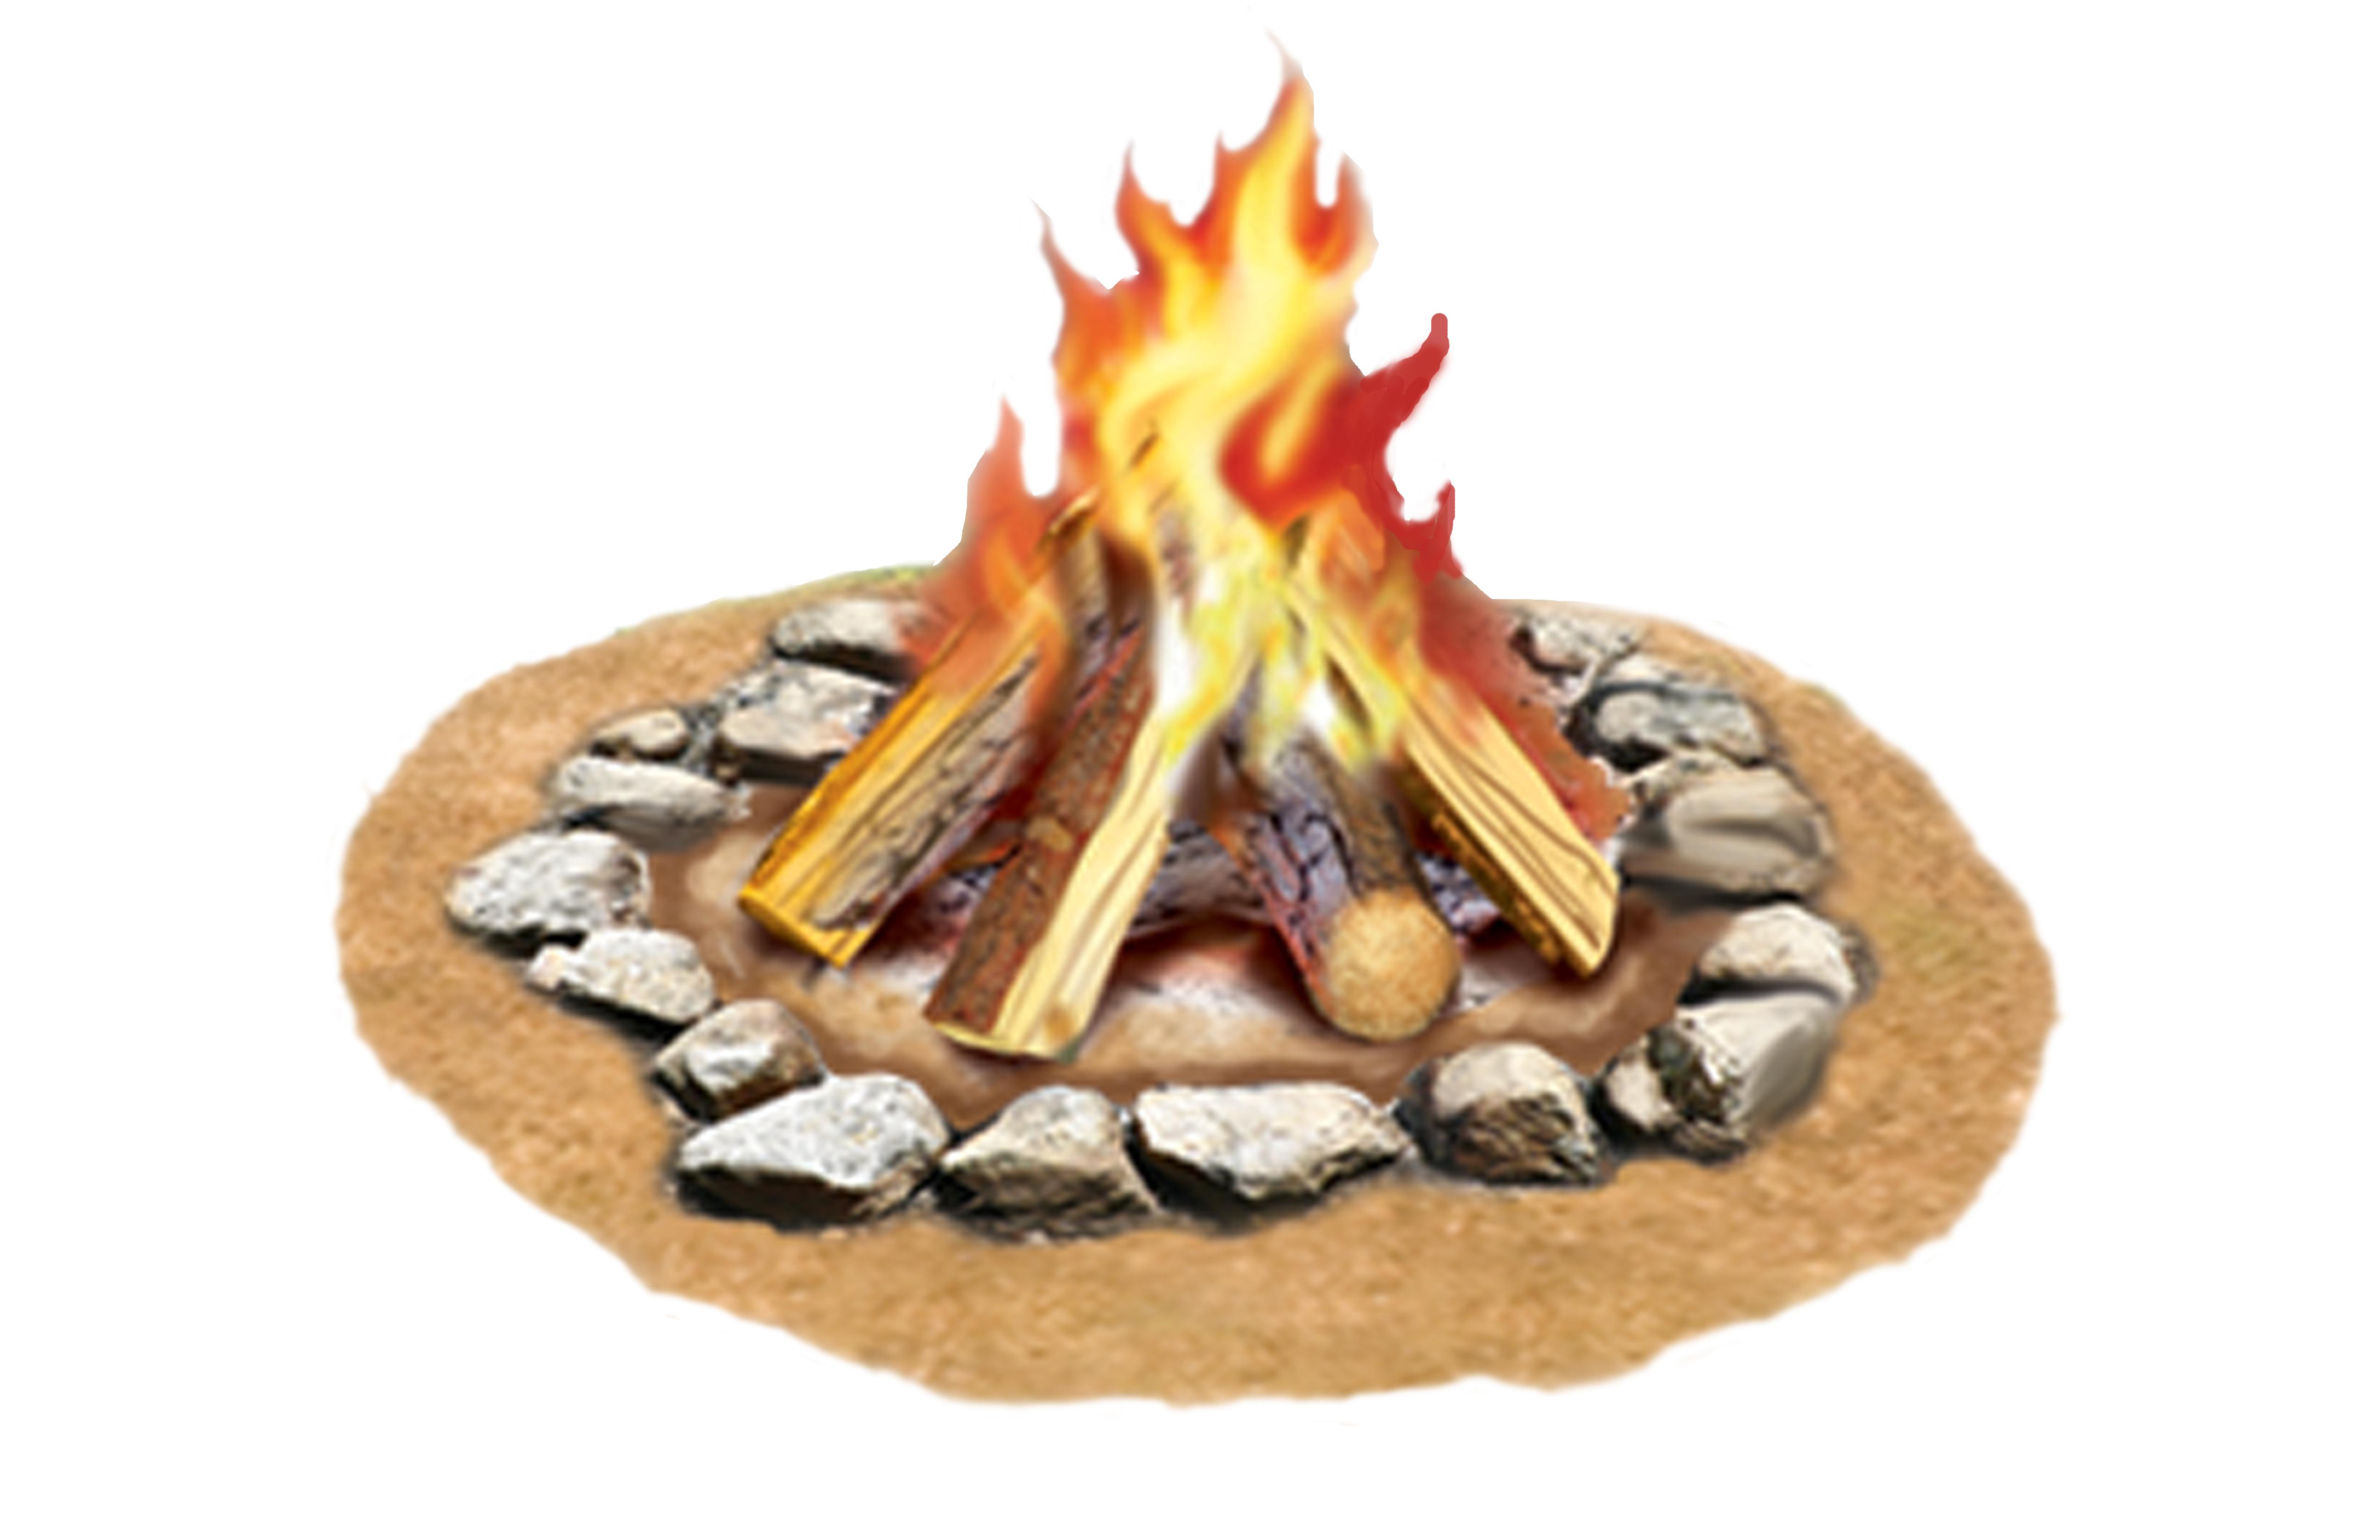 Clip Art Camp Fire Clip Art campfire clipart kid download links campsite trees wooden sign